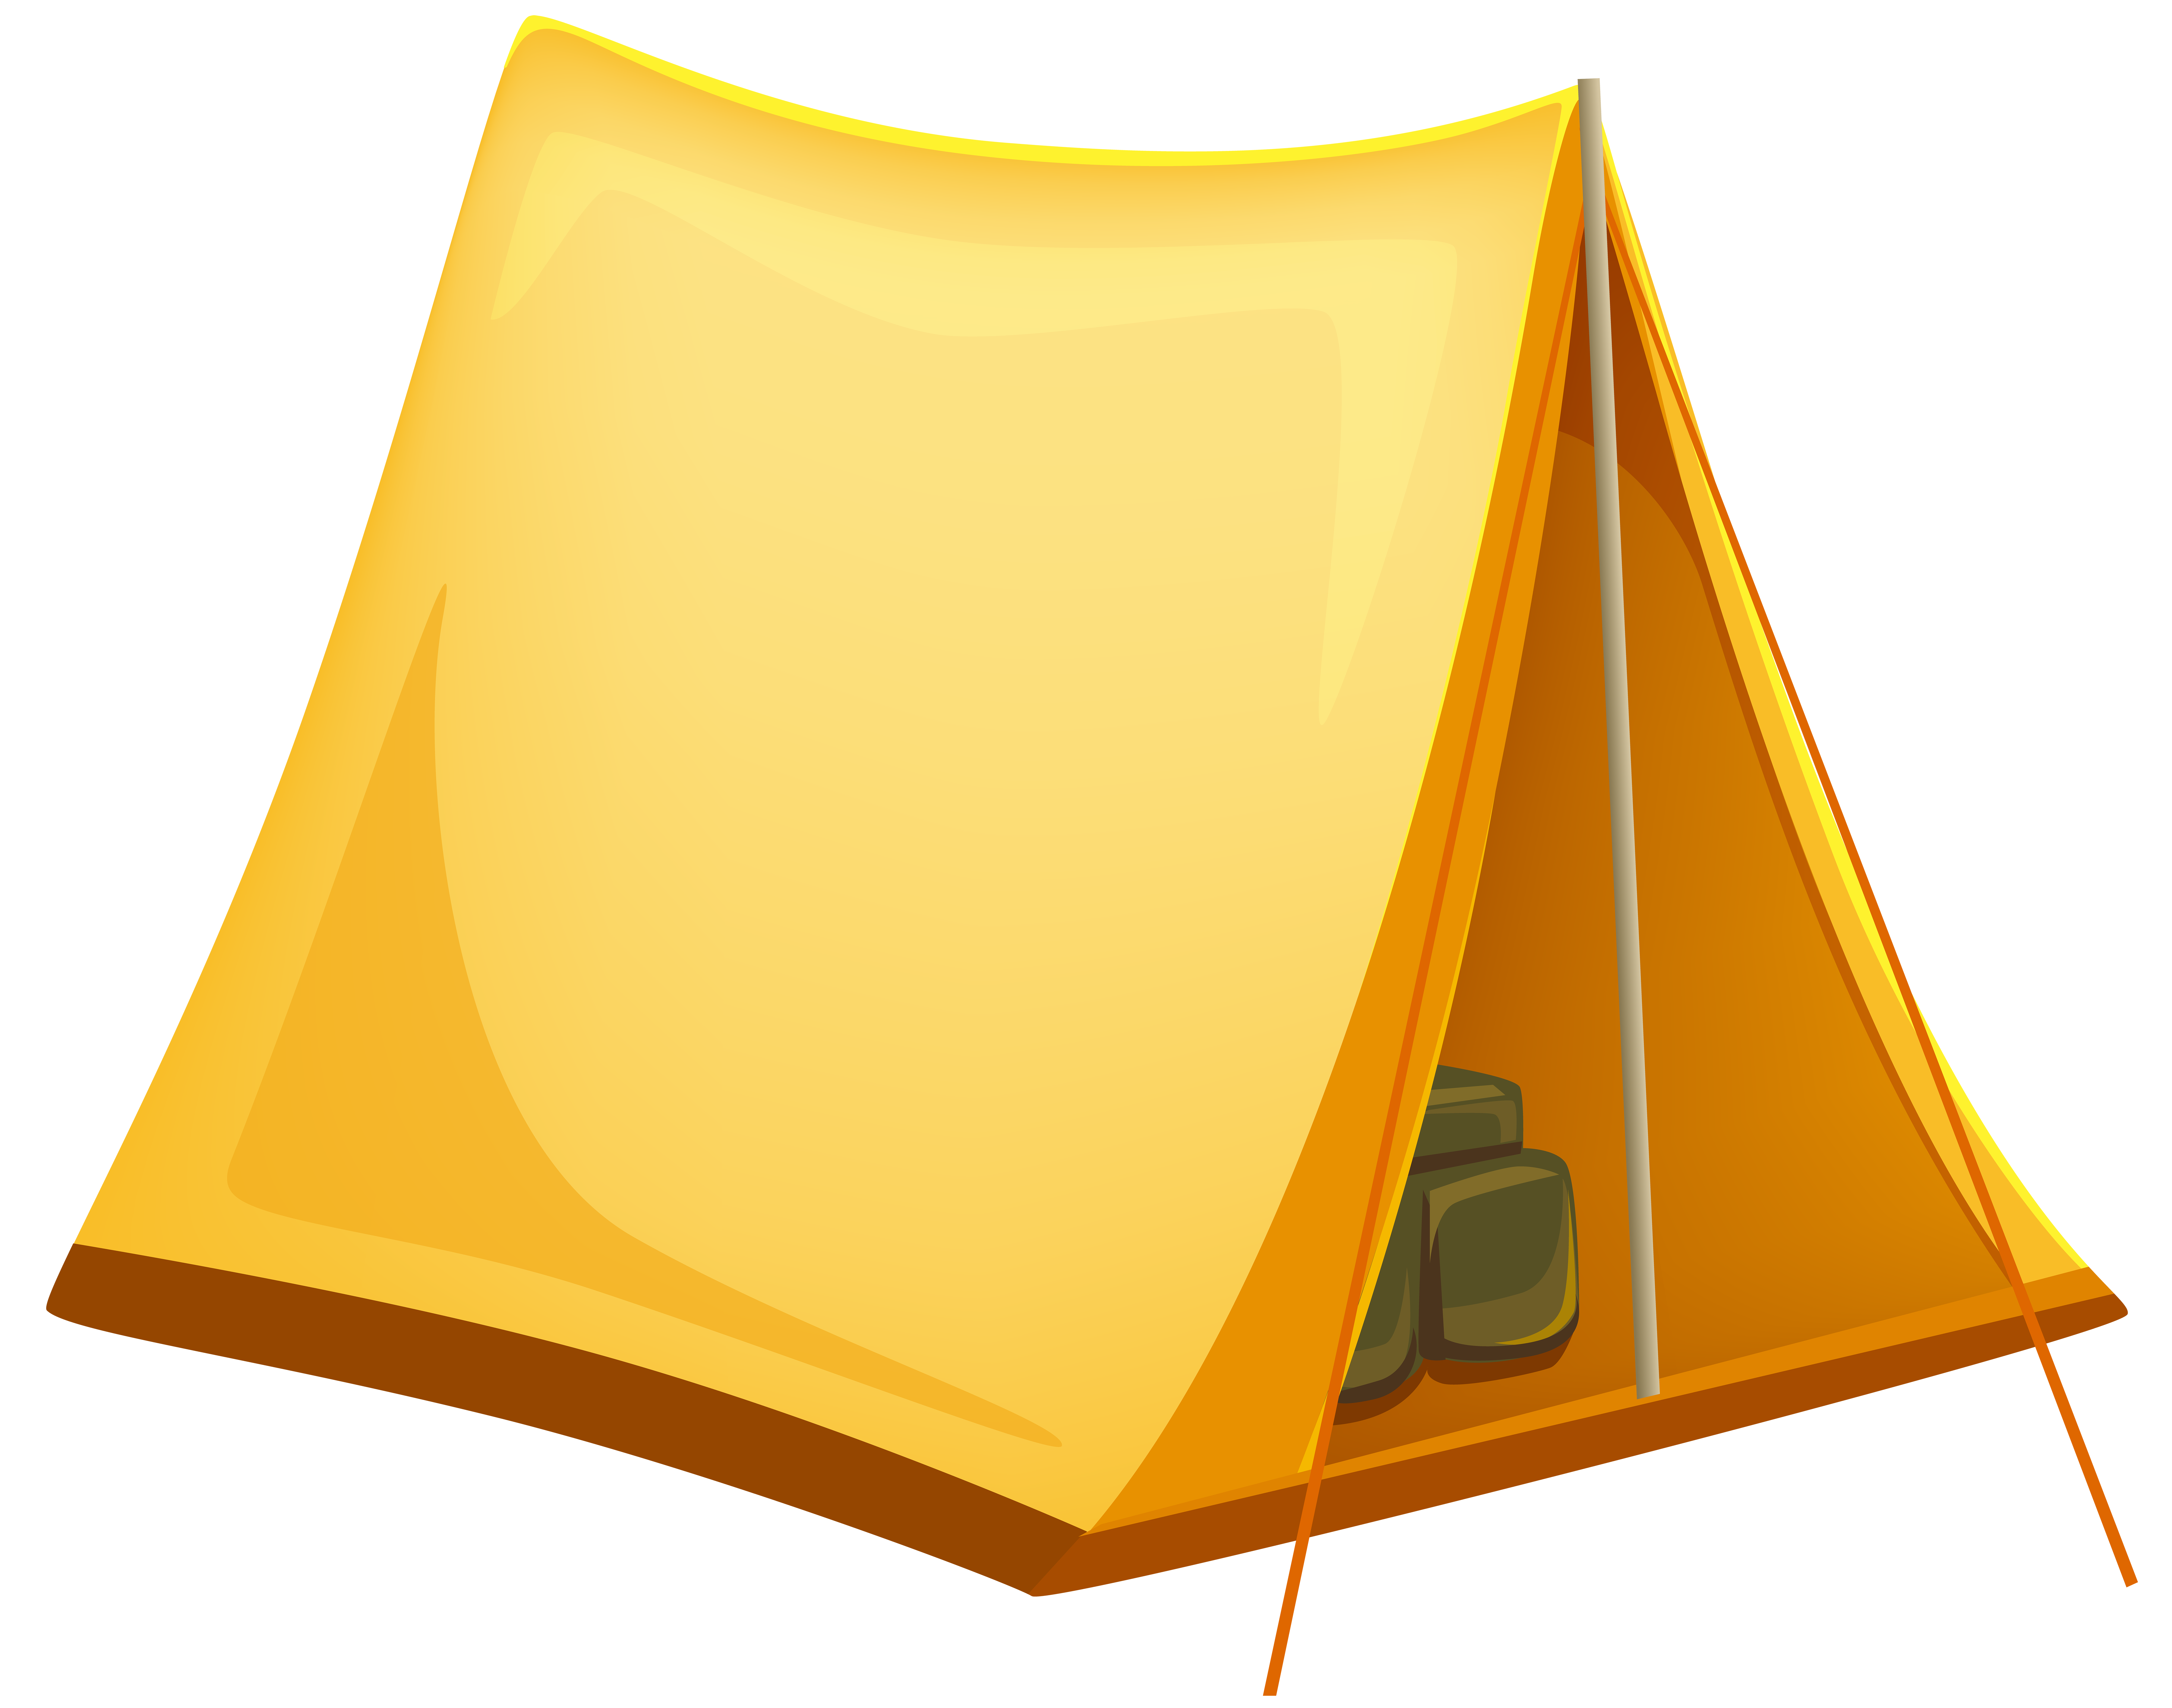 Tent yellow tent